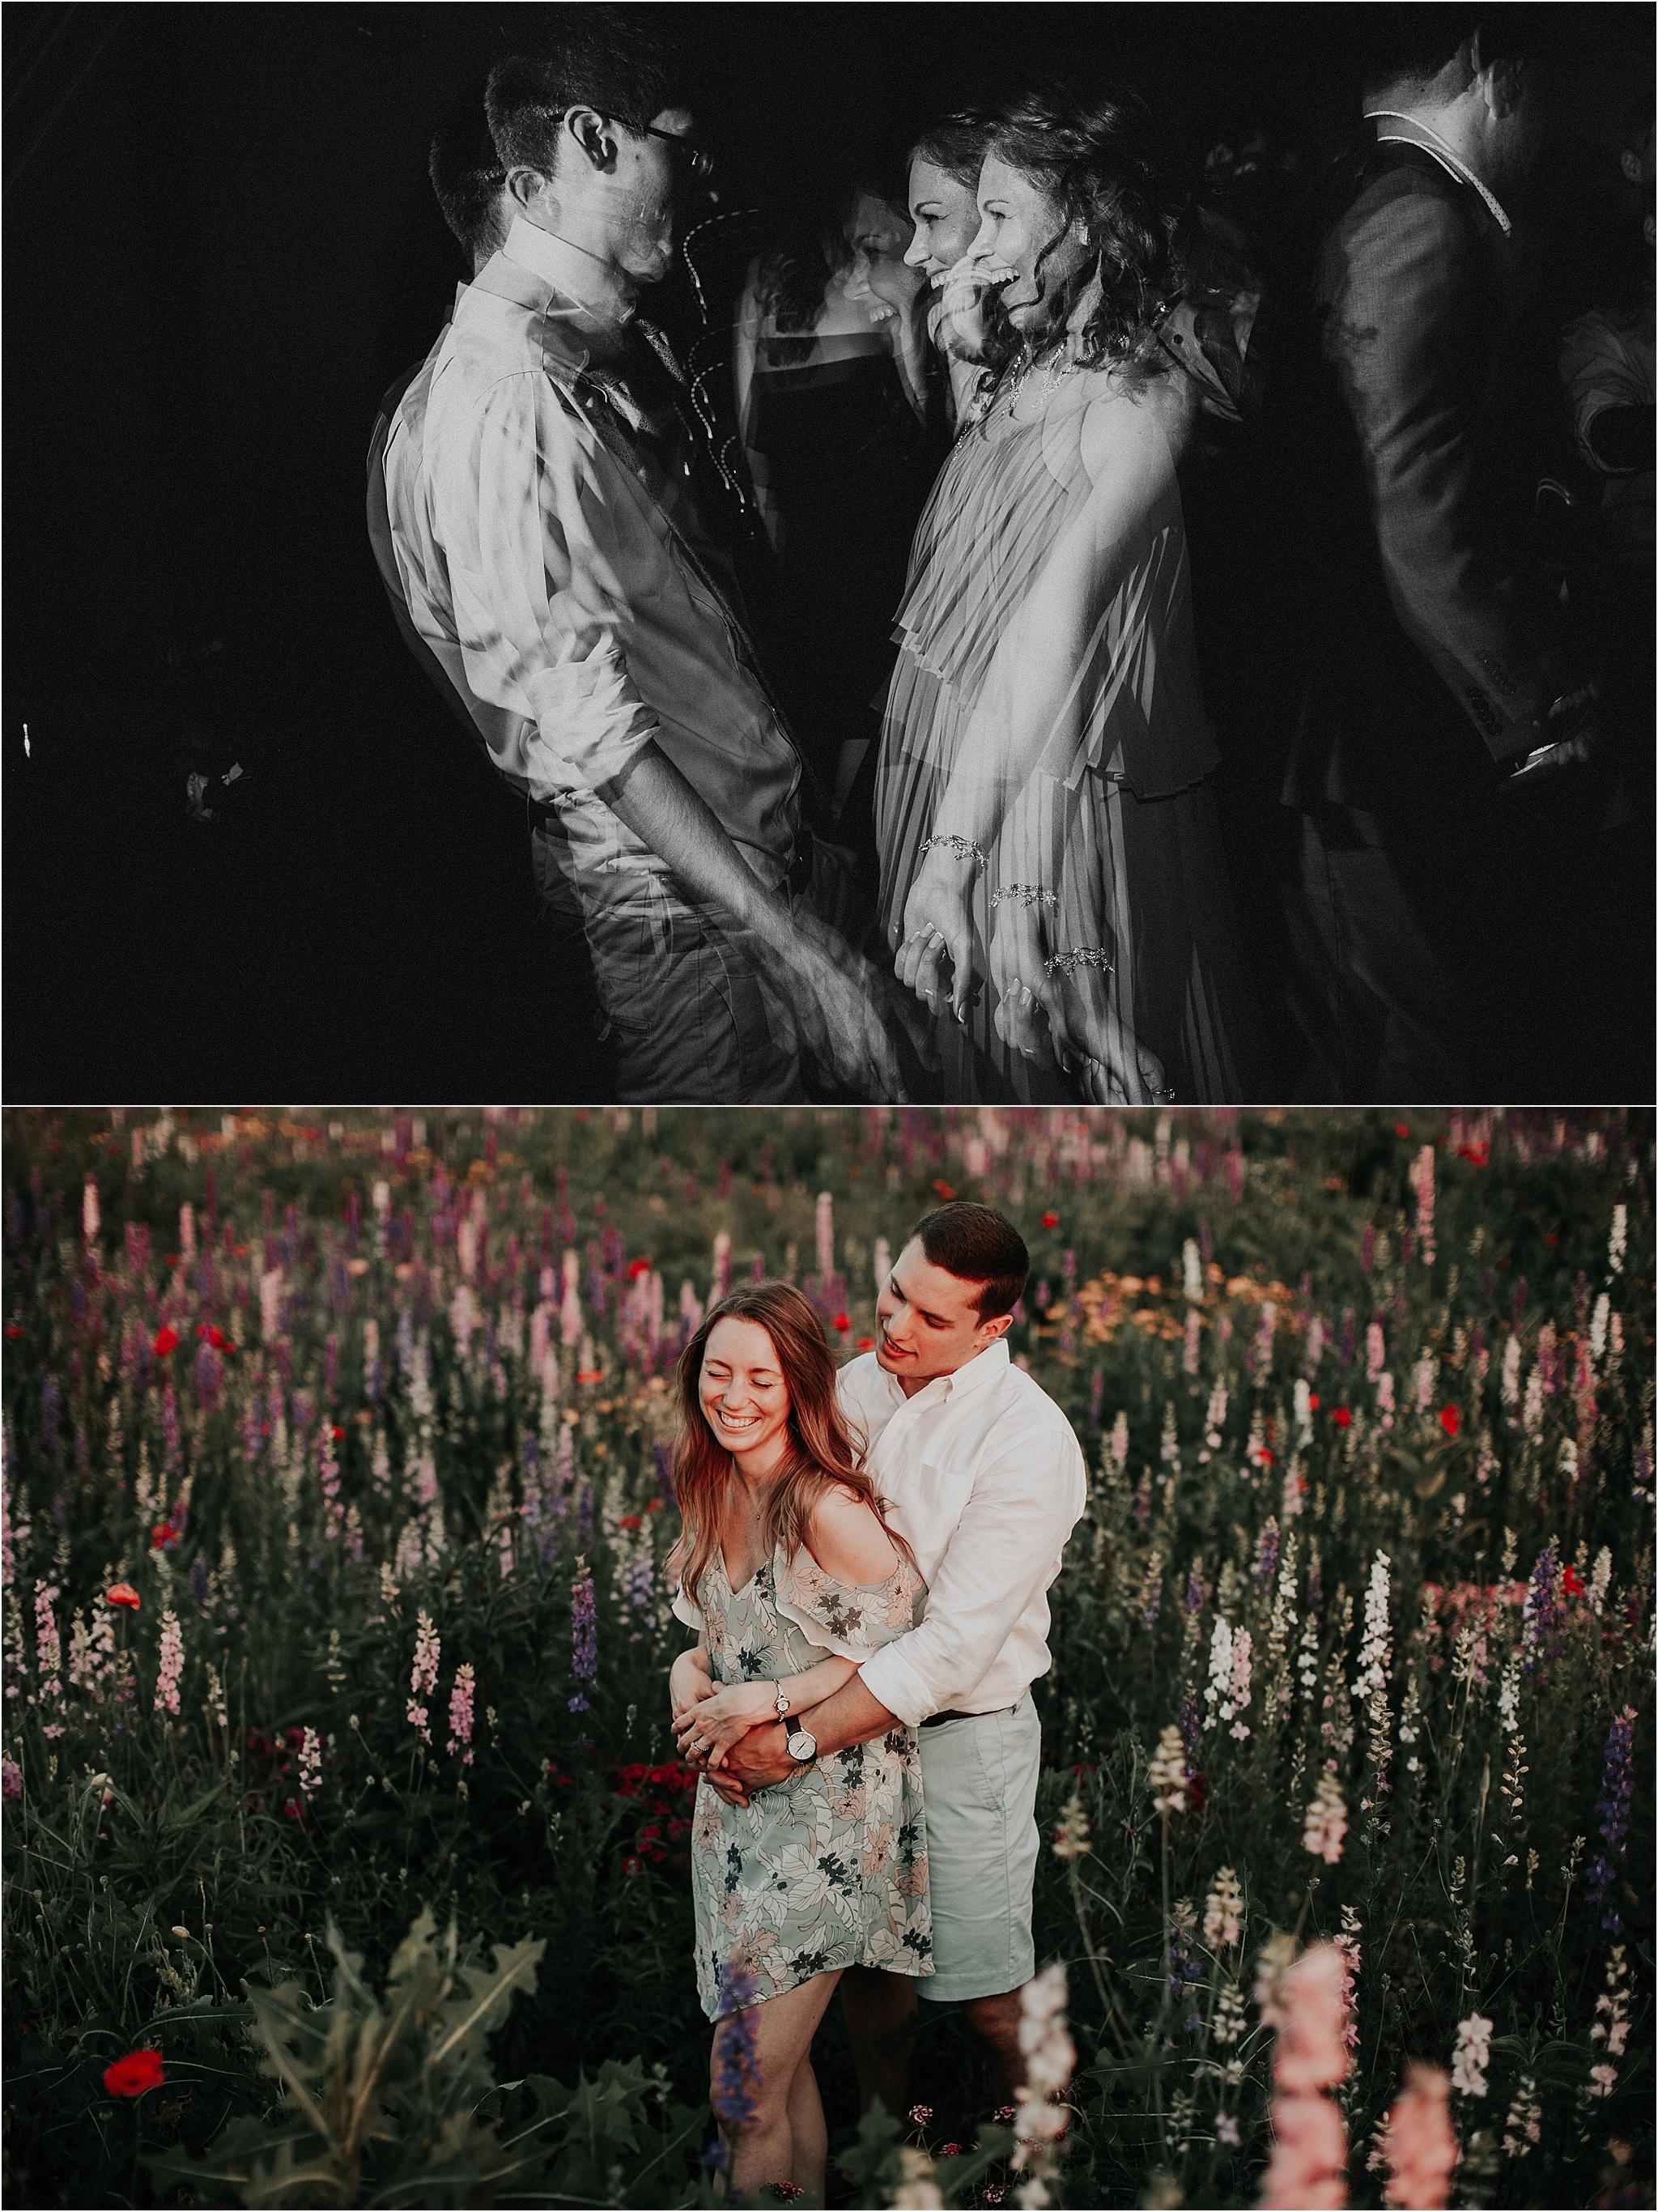 Sarah_Brookhart_Baltimore_Philly_Wedding_Photographer_0019.jpg